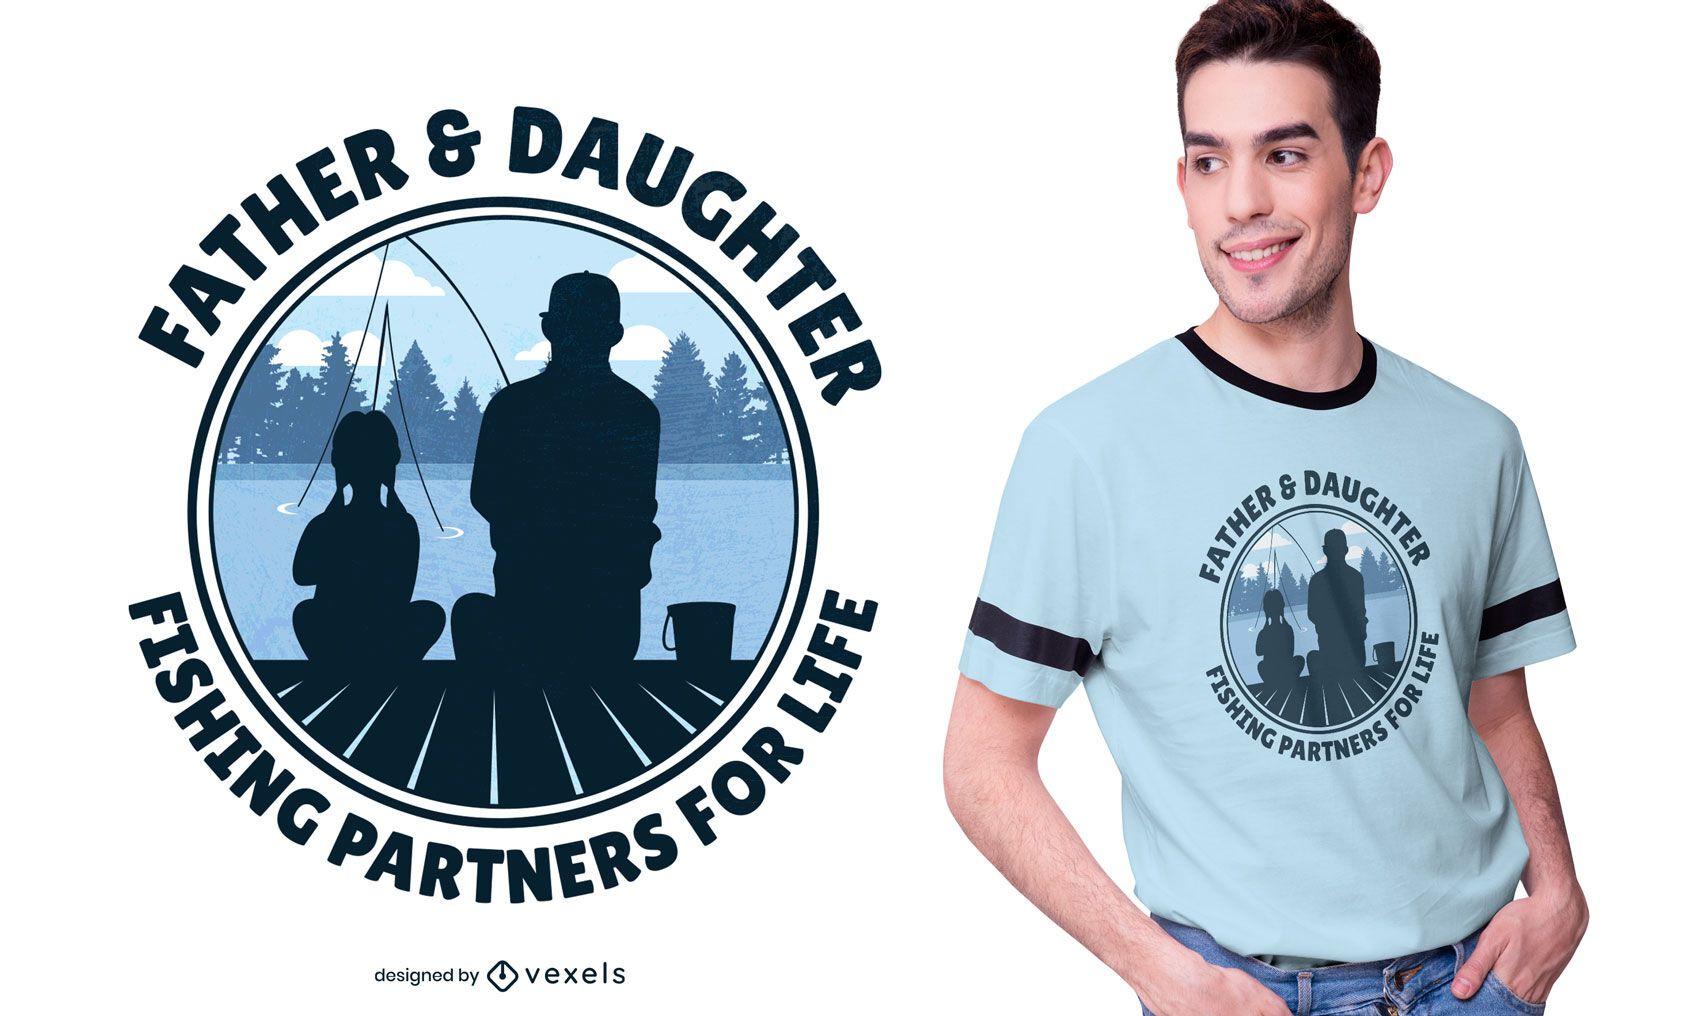 Father & daughter fishing t-shirt design